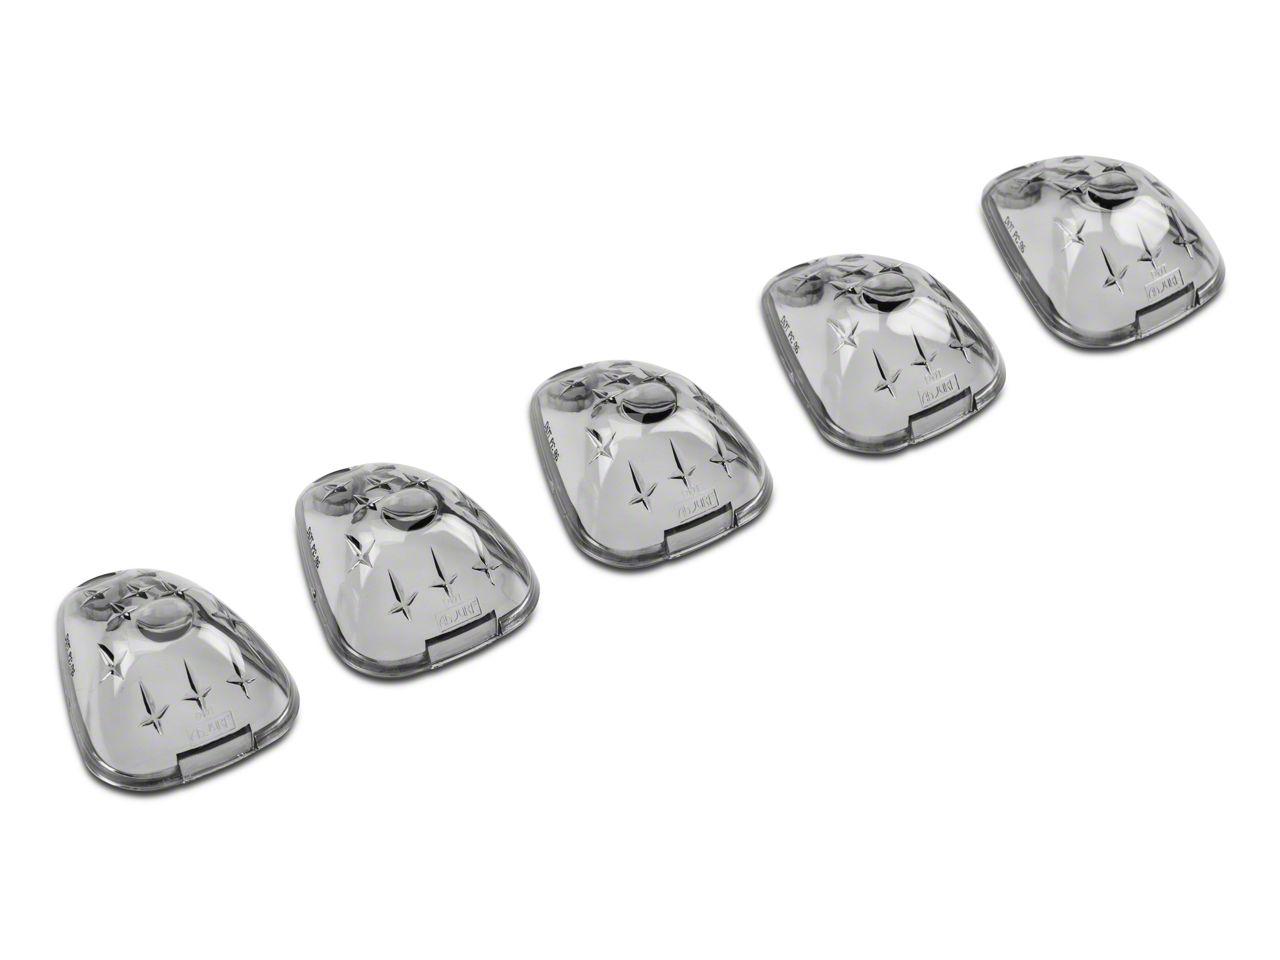 Alteon Platinum Smoke Cab Roof Lights (97-03 F-150)